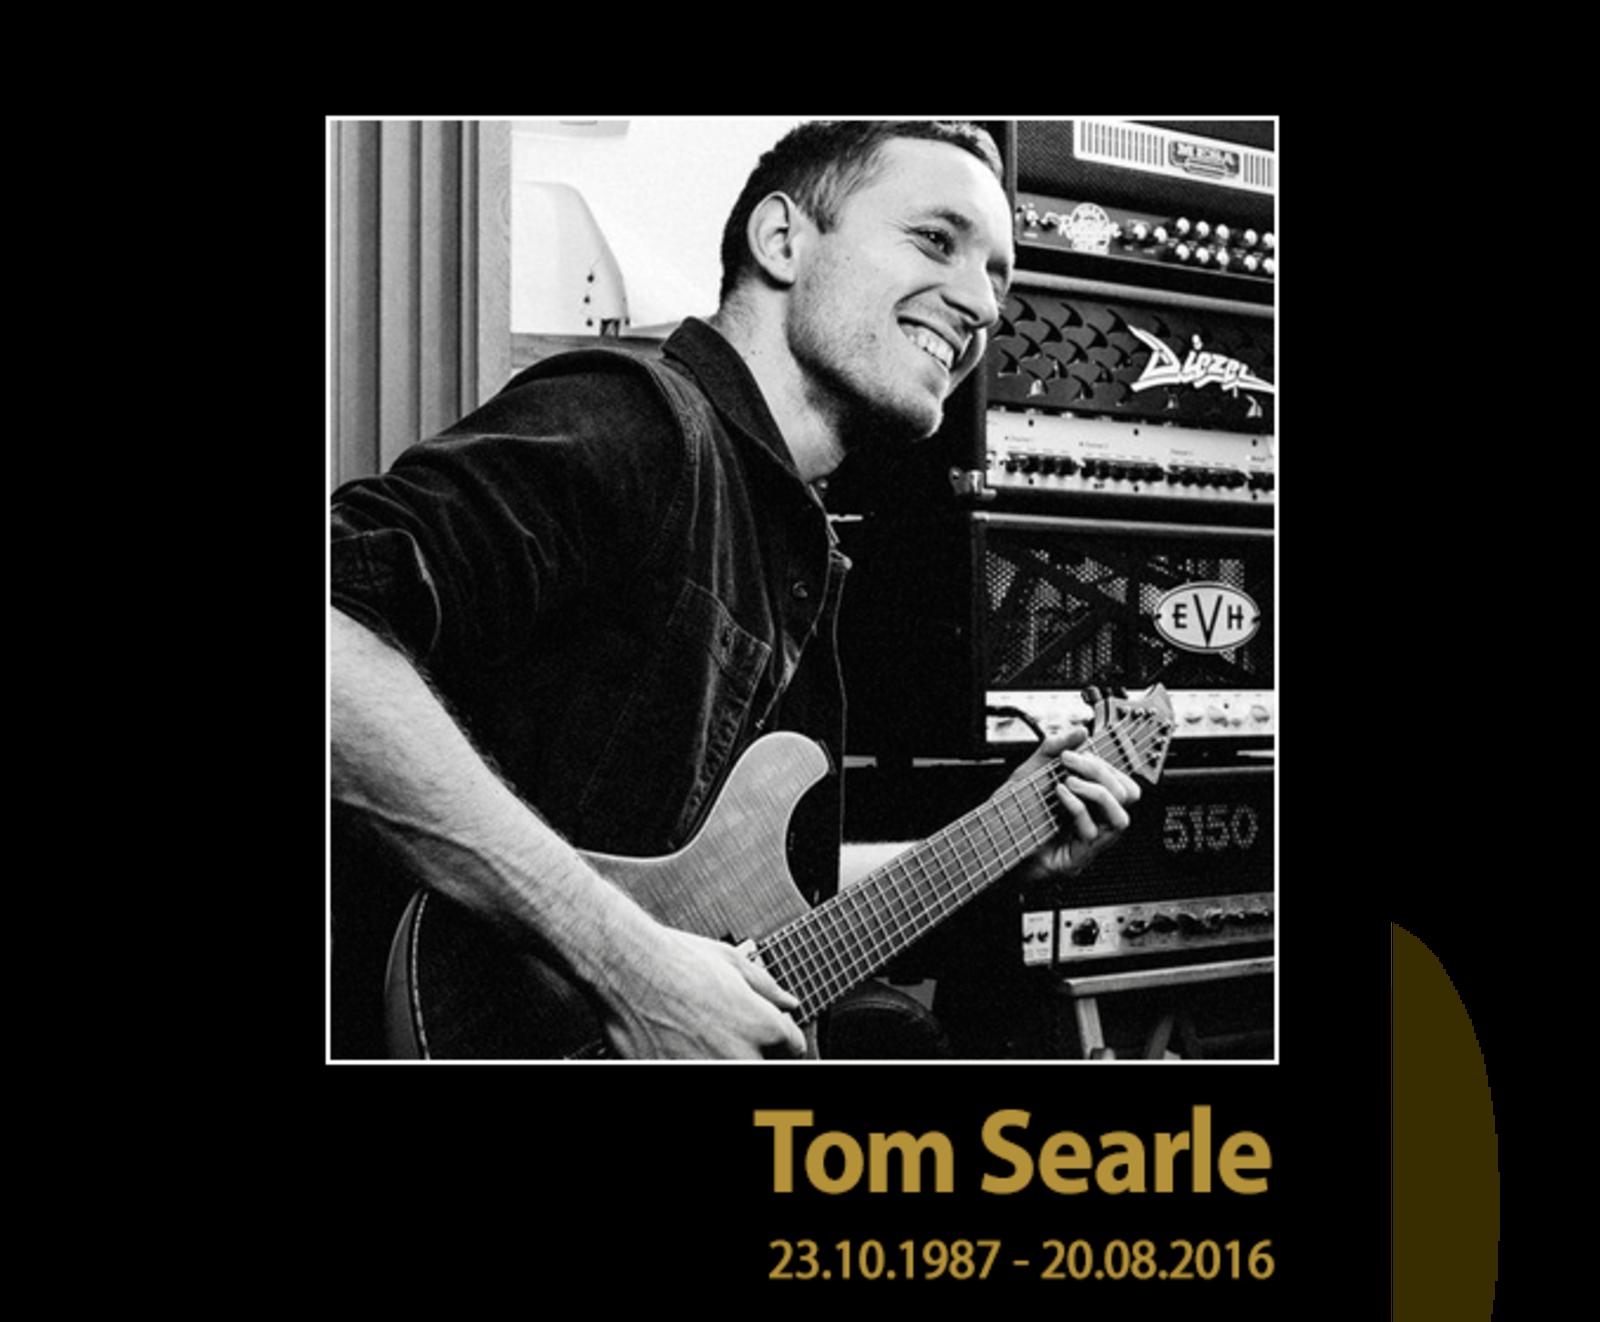 Tom Searle